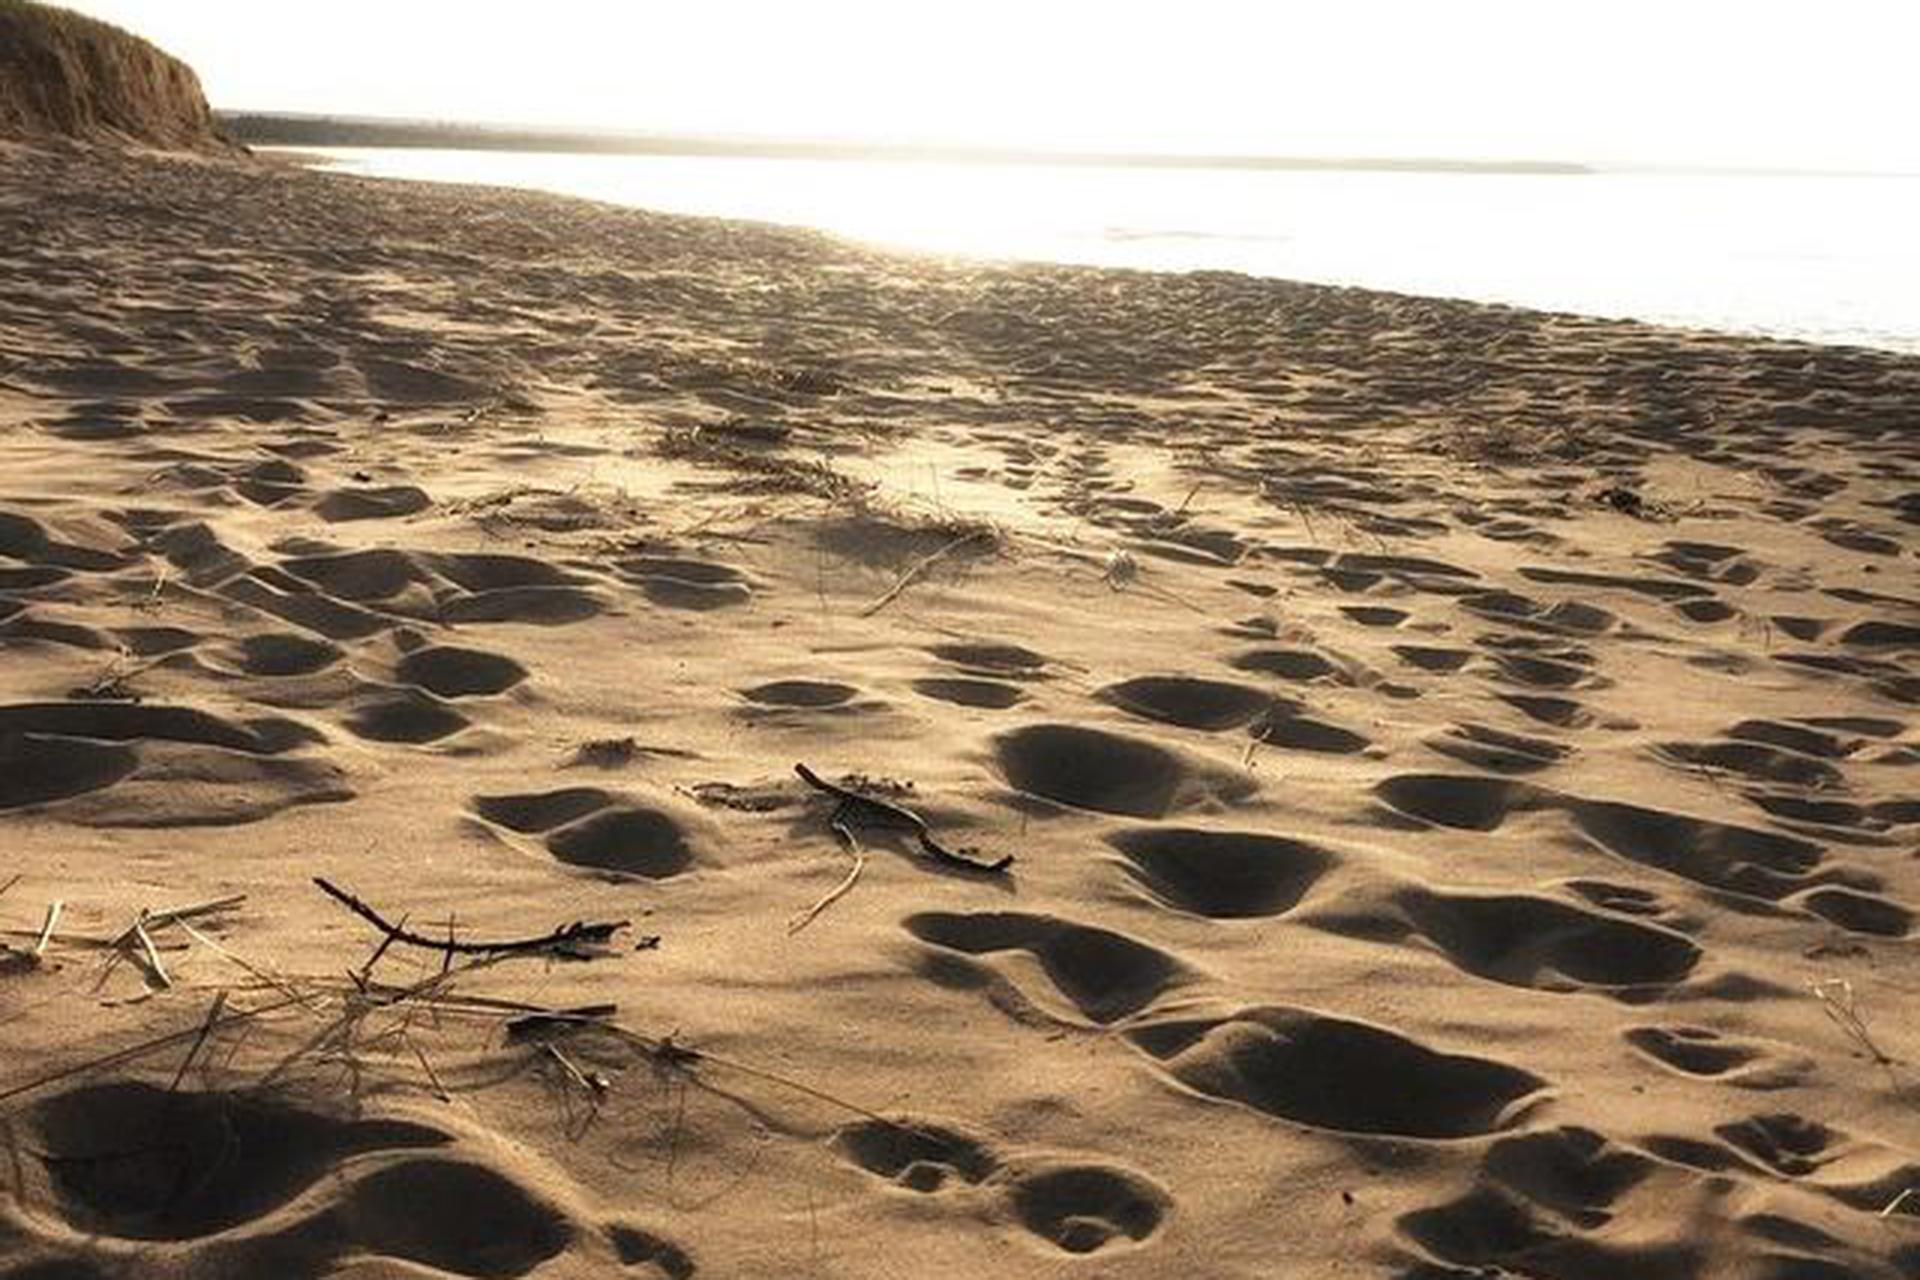 Singing Sands in Bete Grise, Michigan; Courtesy of Instagram User @KelsNewcomb/Kelsie Newcomb